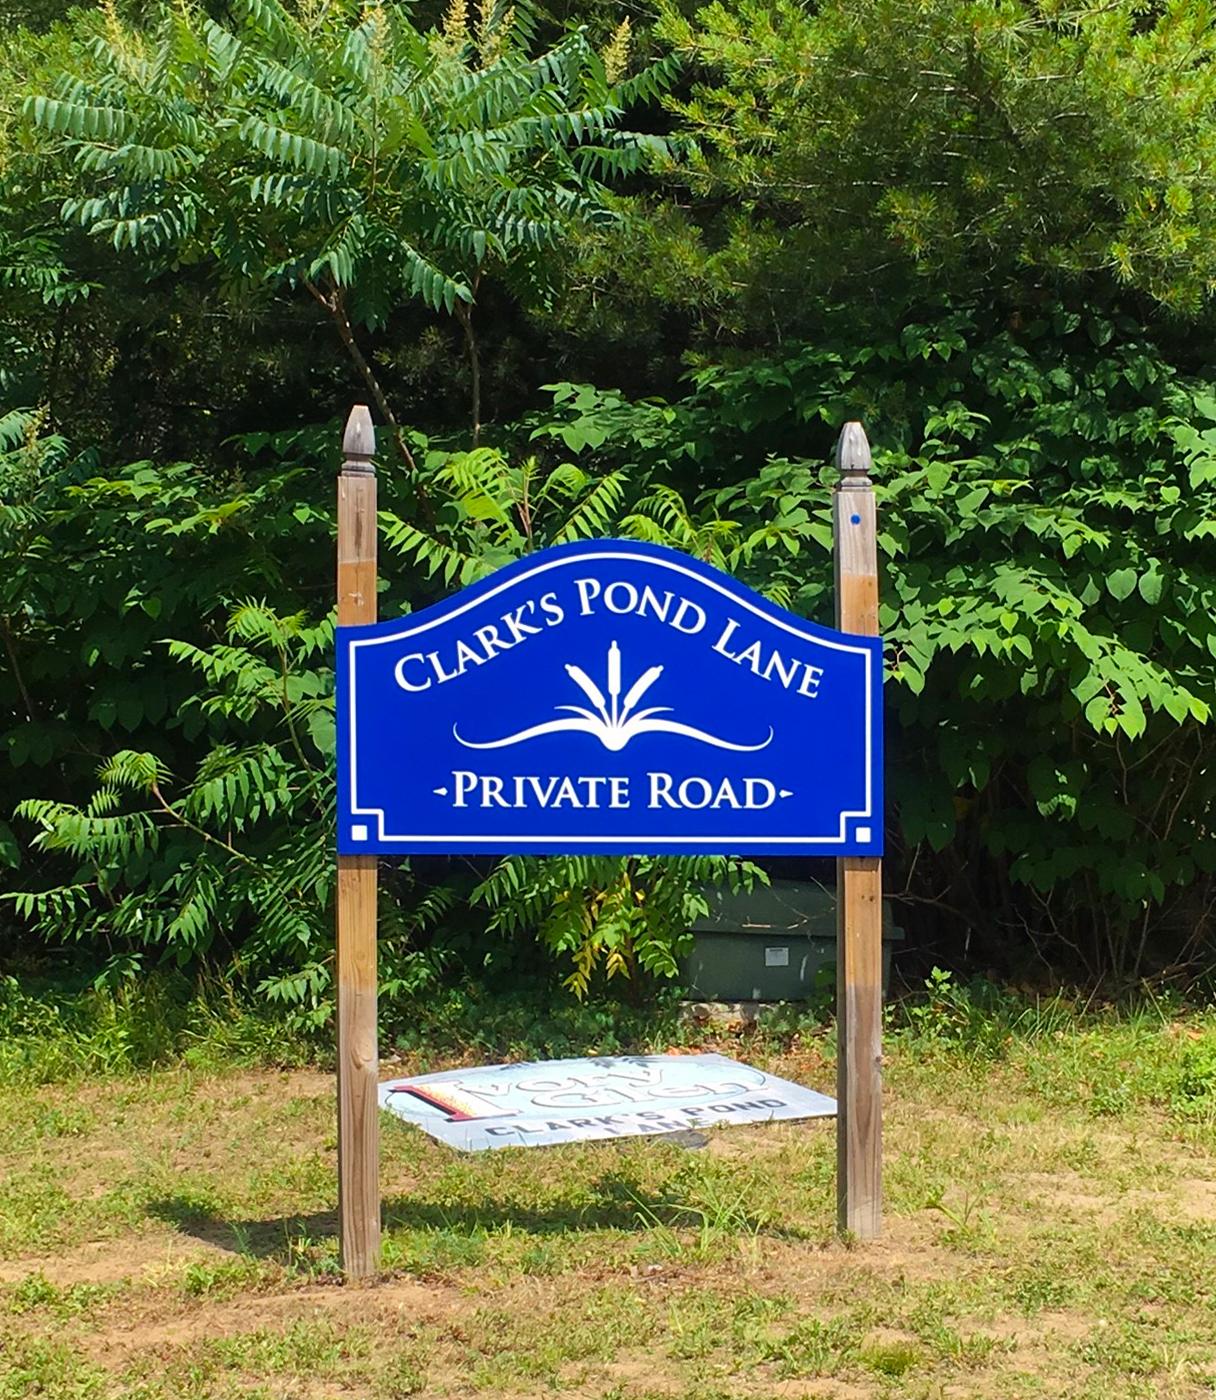 Clarks Pond Lane